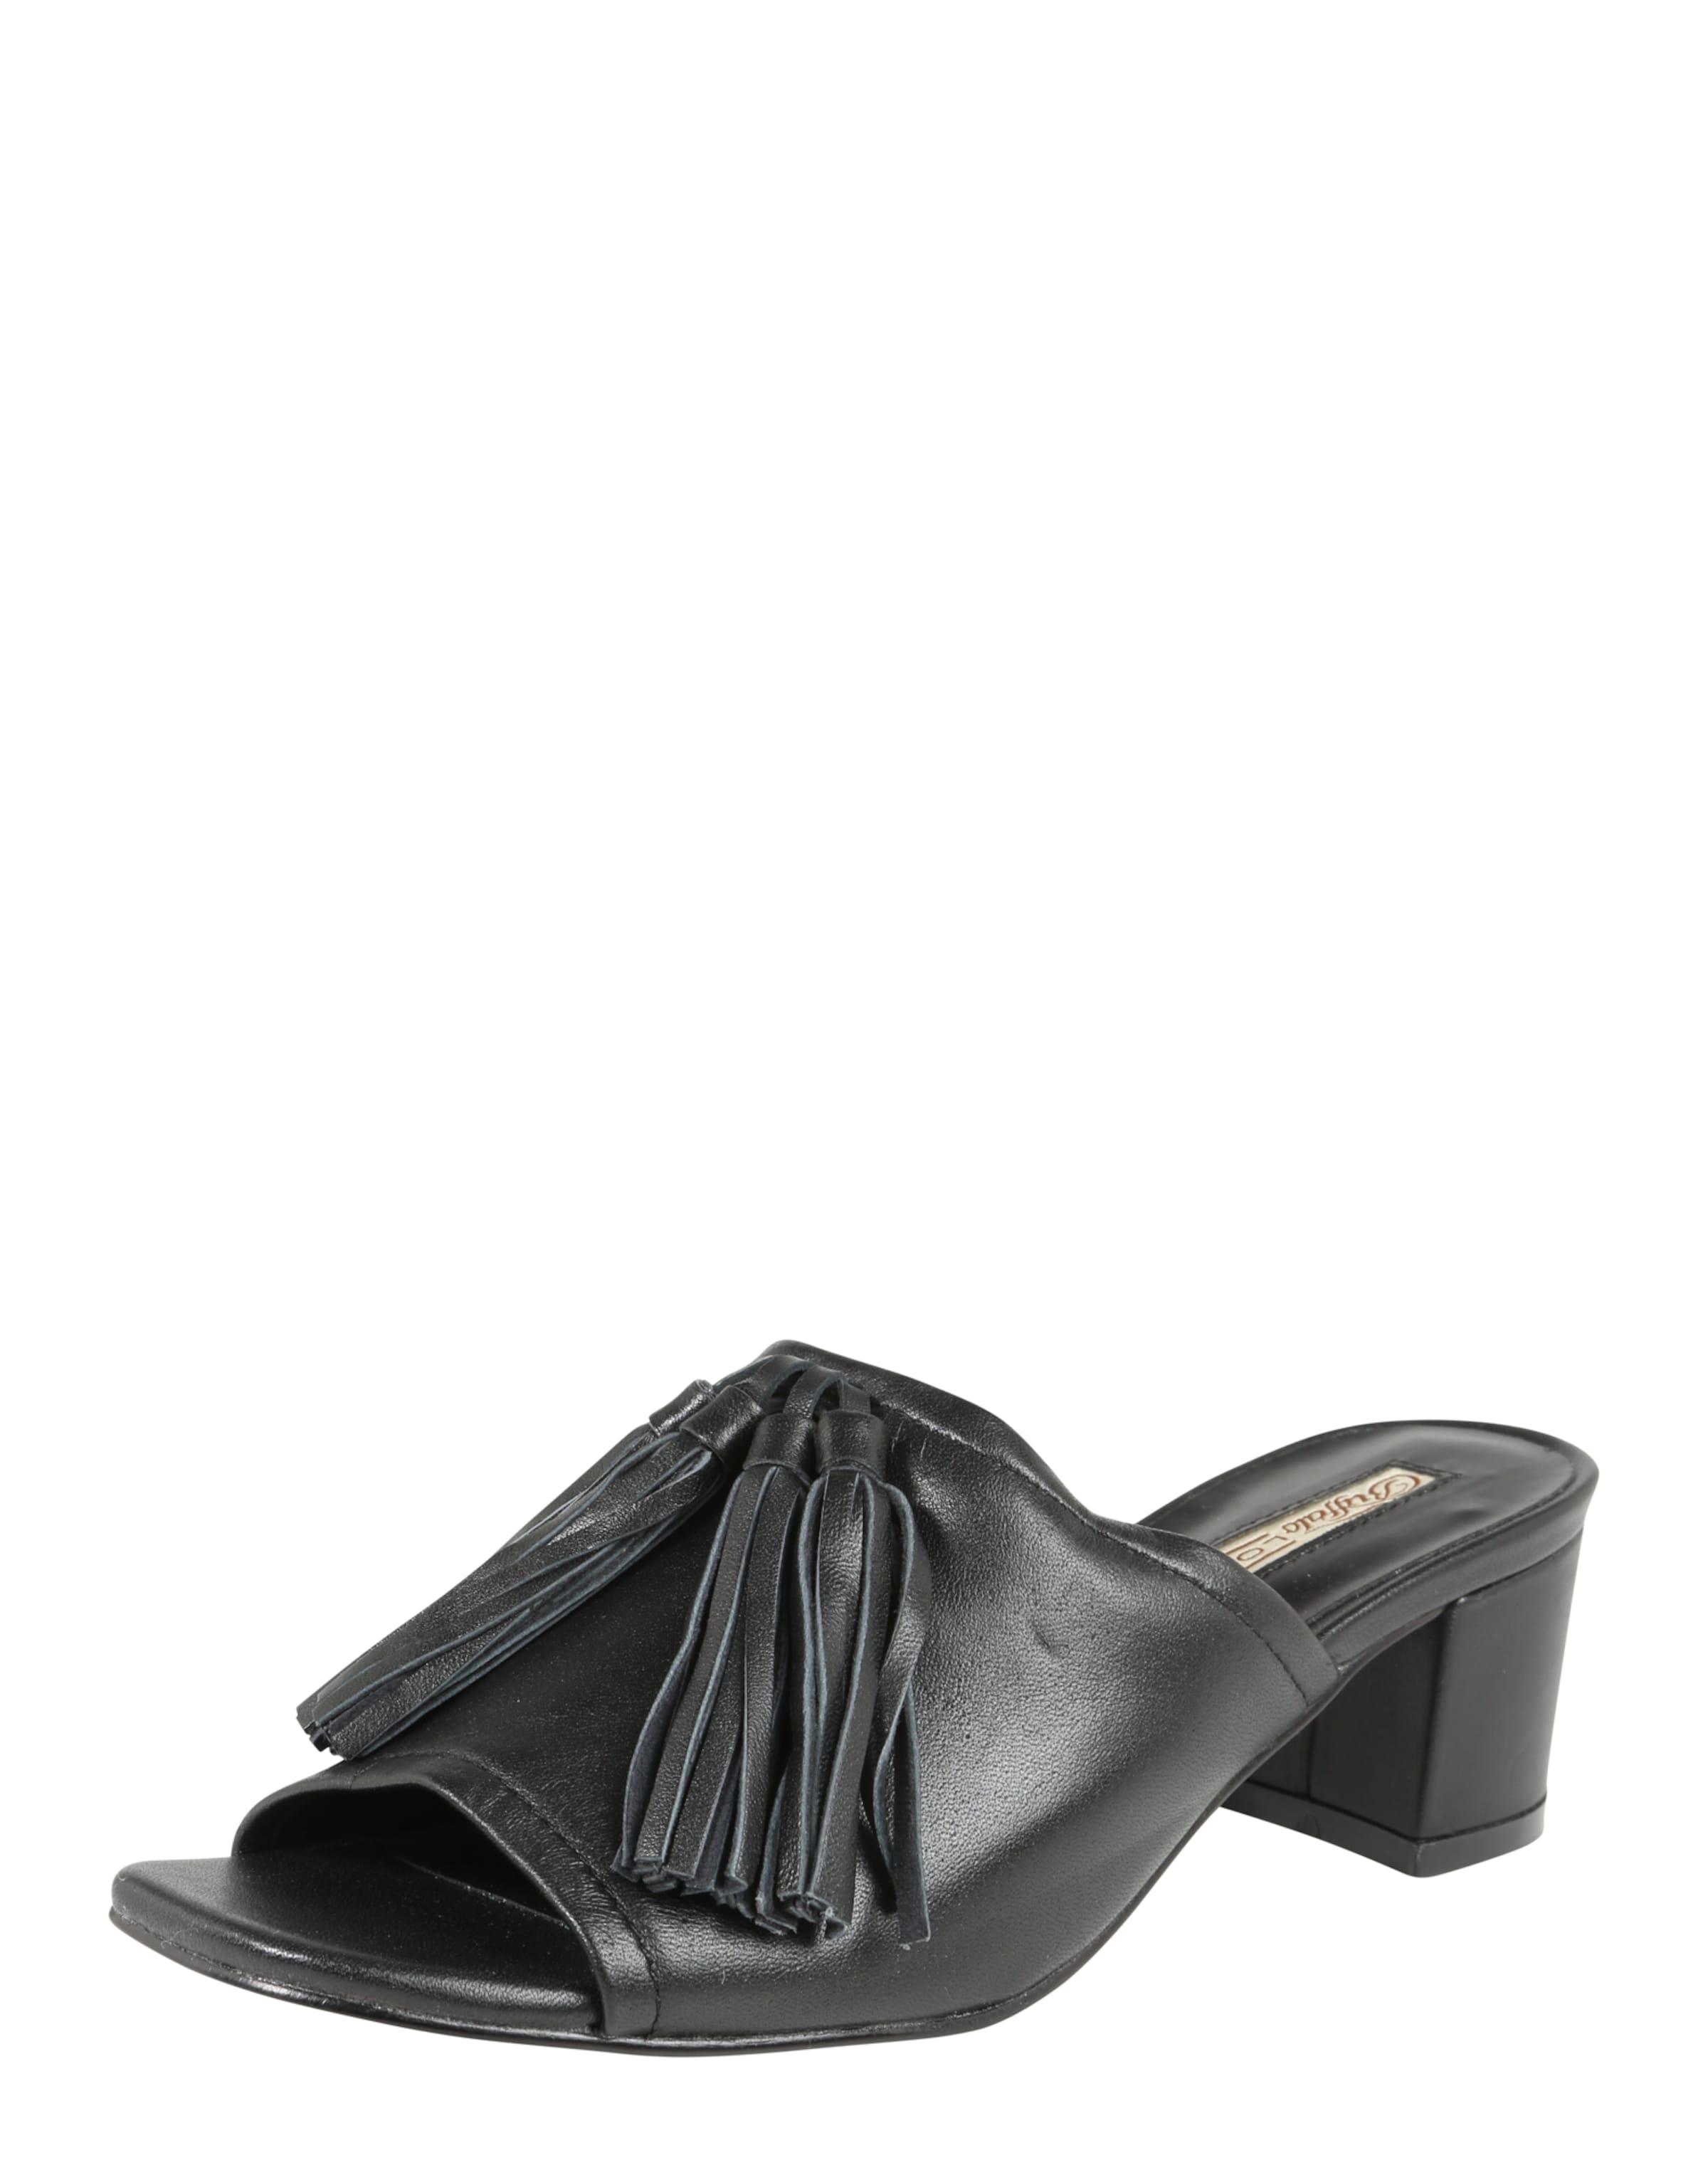 BUFFALO Pantoletten Verschleißfeste billige Schuhe Hohe Qualität